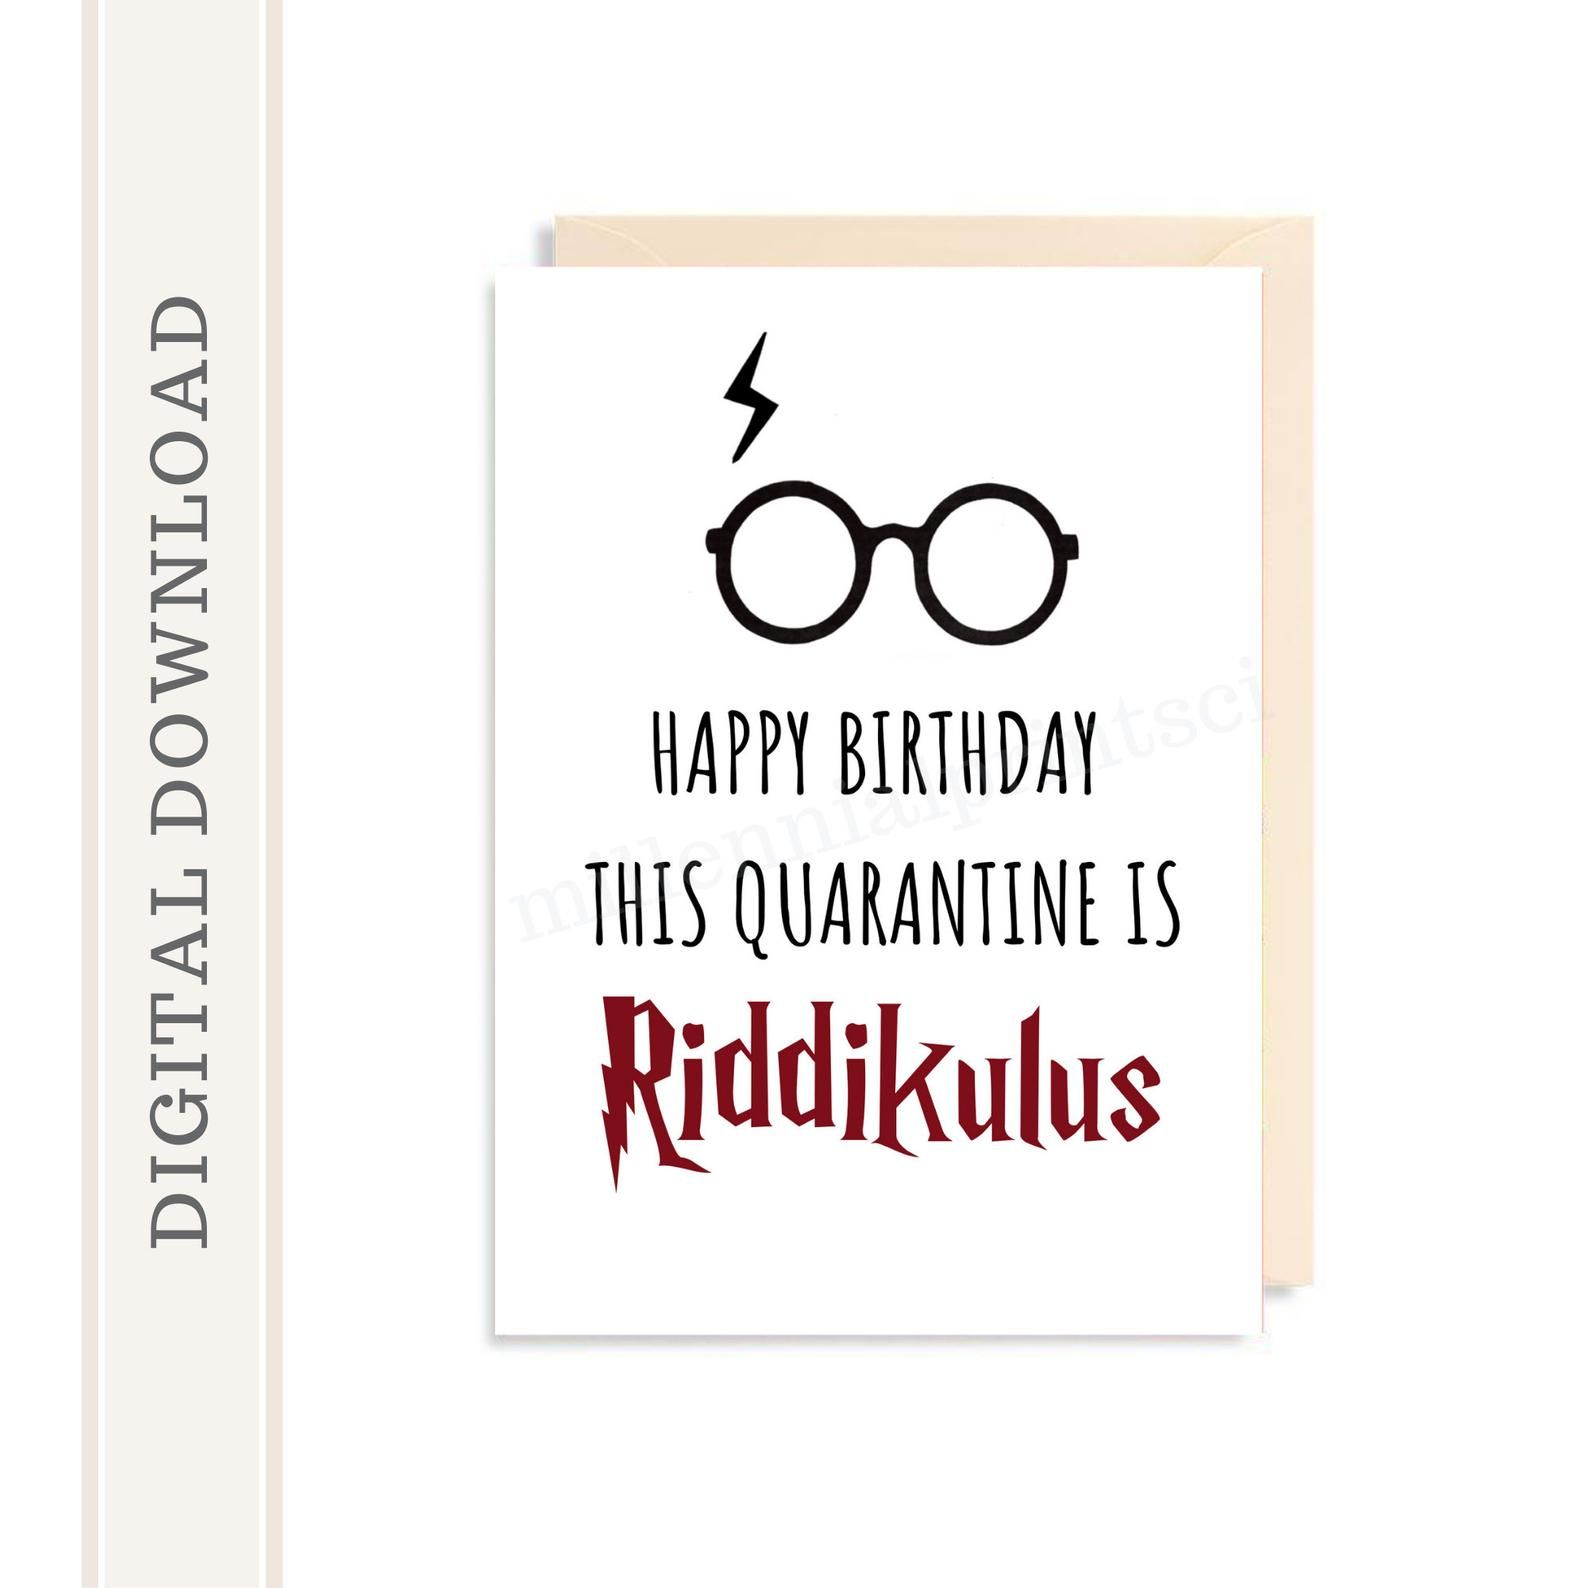 Printable Harry Potter Riddikulus Spell Birthday Card Diy Digital Download Design Feat Harry Potter Birthday Cards Harry Potter Cards Harry Potter Birthday